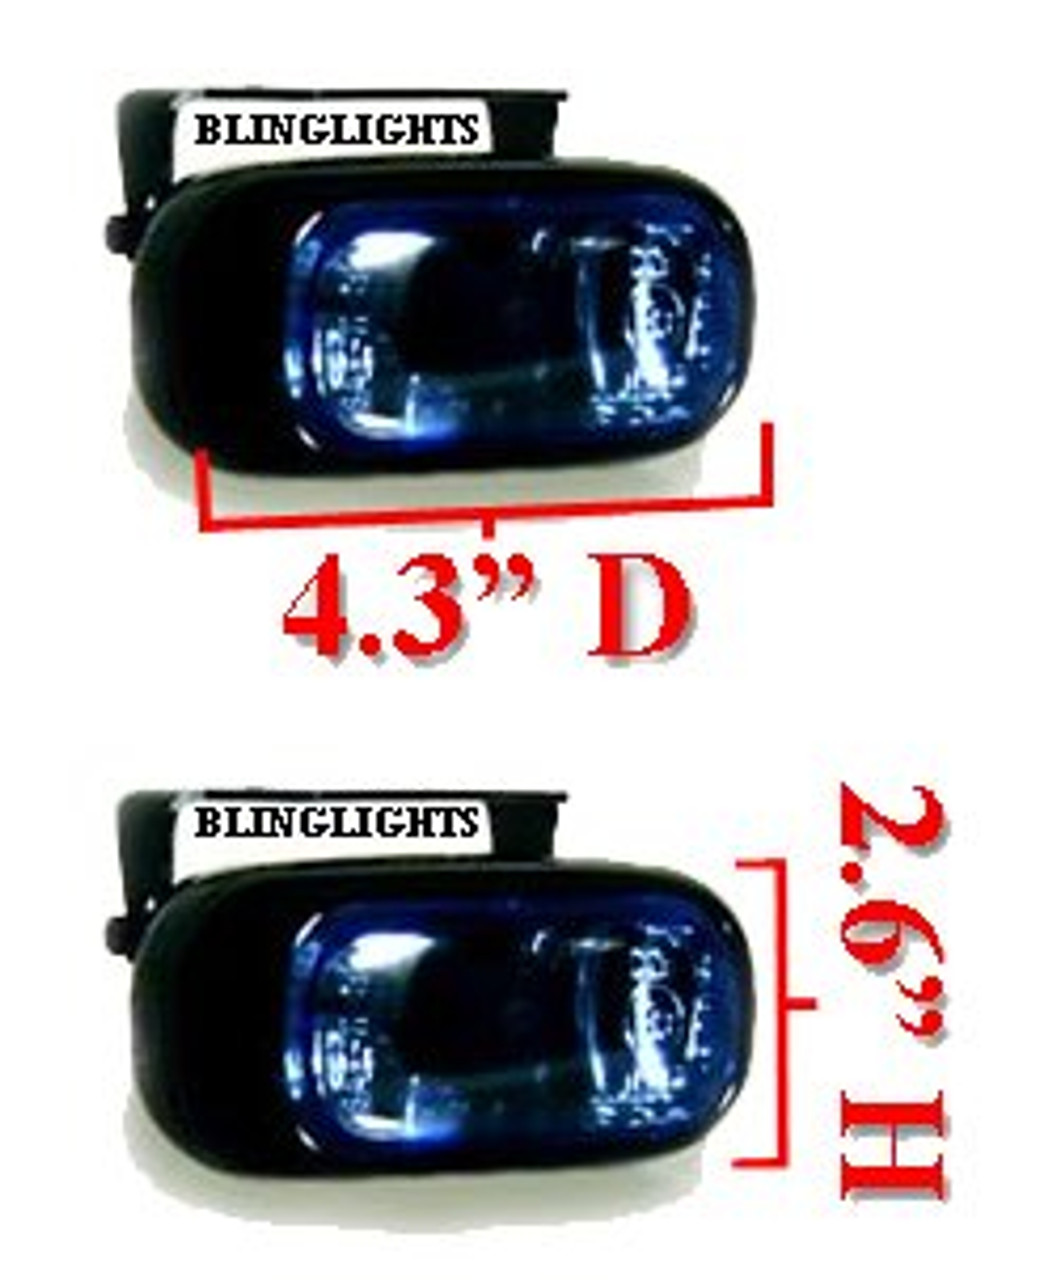 2002 2003 2004 2005 2006 2007 2008 2009 Hummer H2 Xenon Fog Lamps Driving Lights Kit